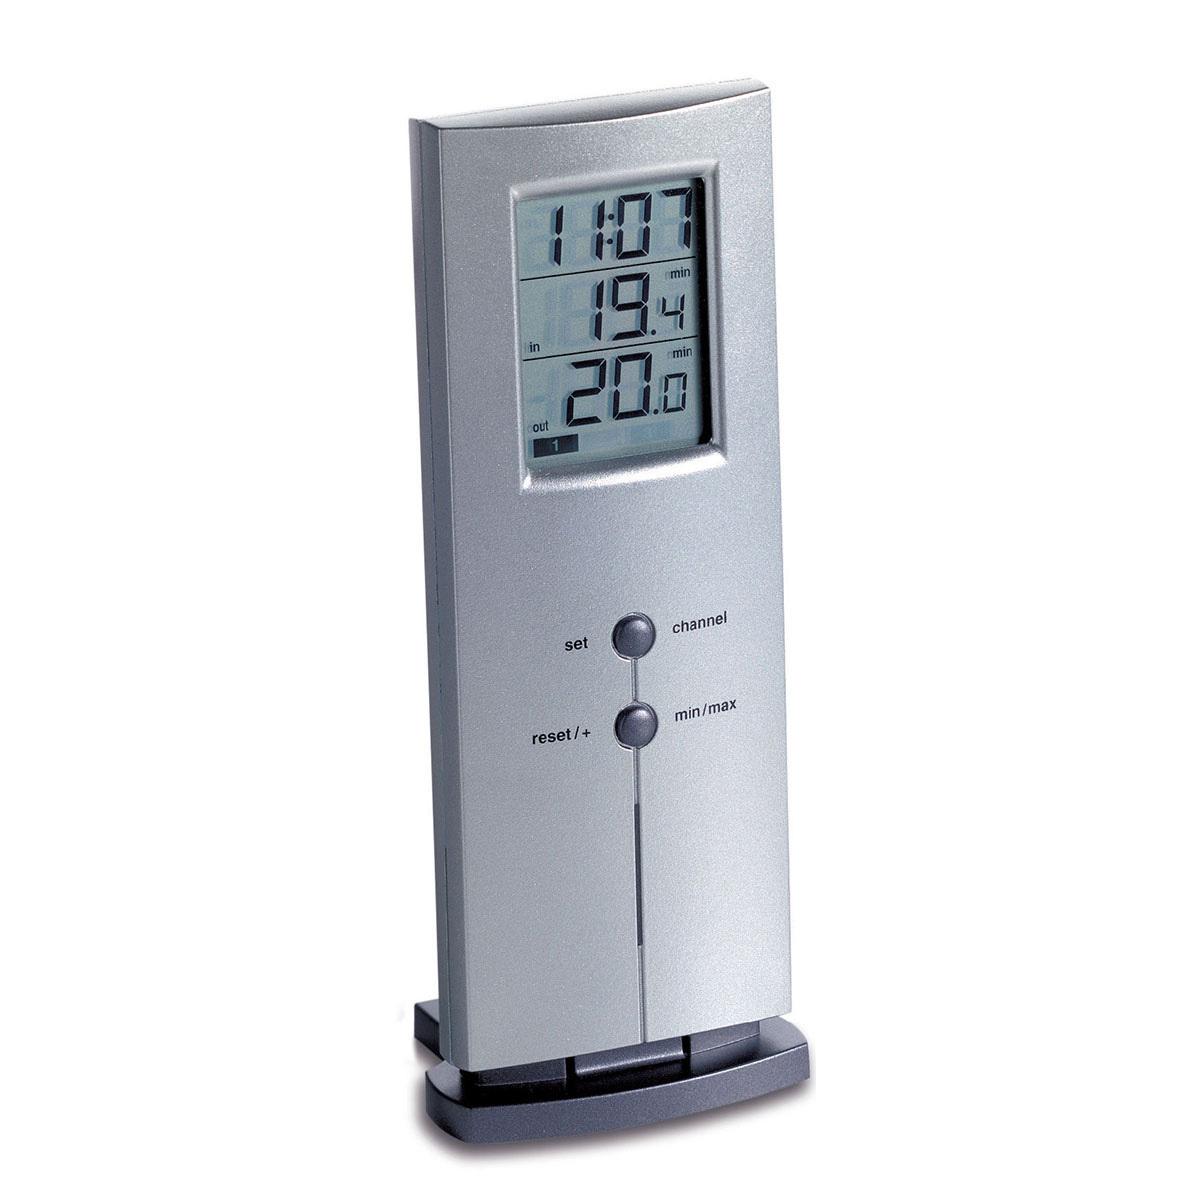 30-3009-54-it-funk-thermometer-logo-1200x1200px.jpg